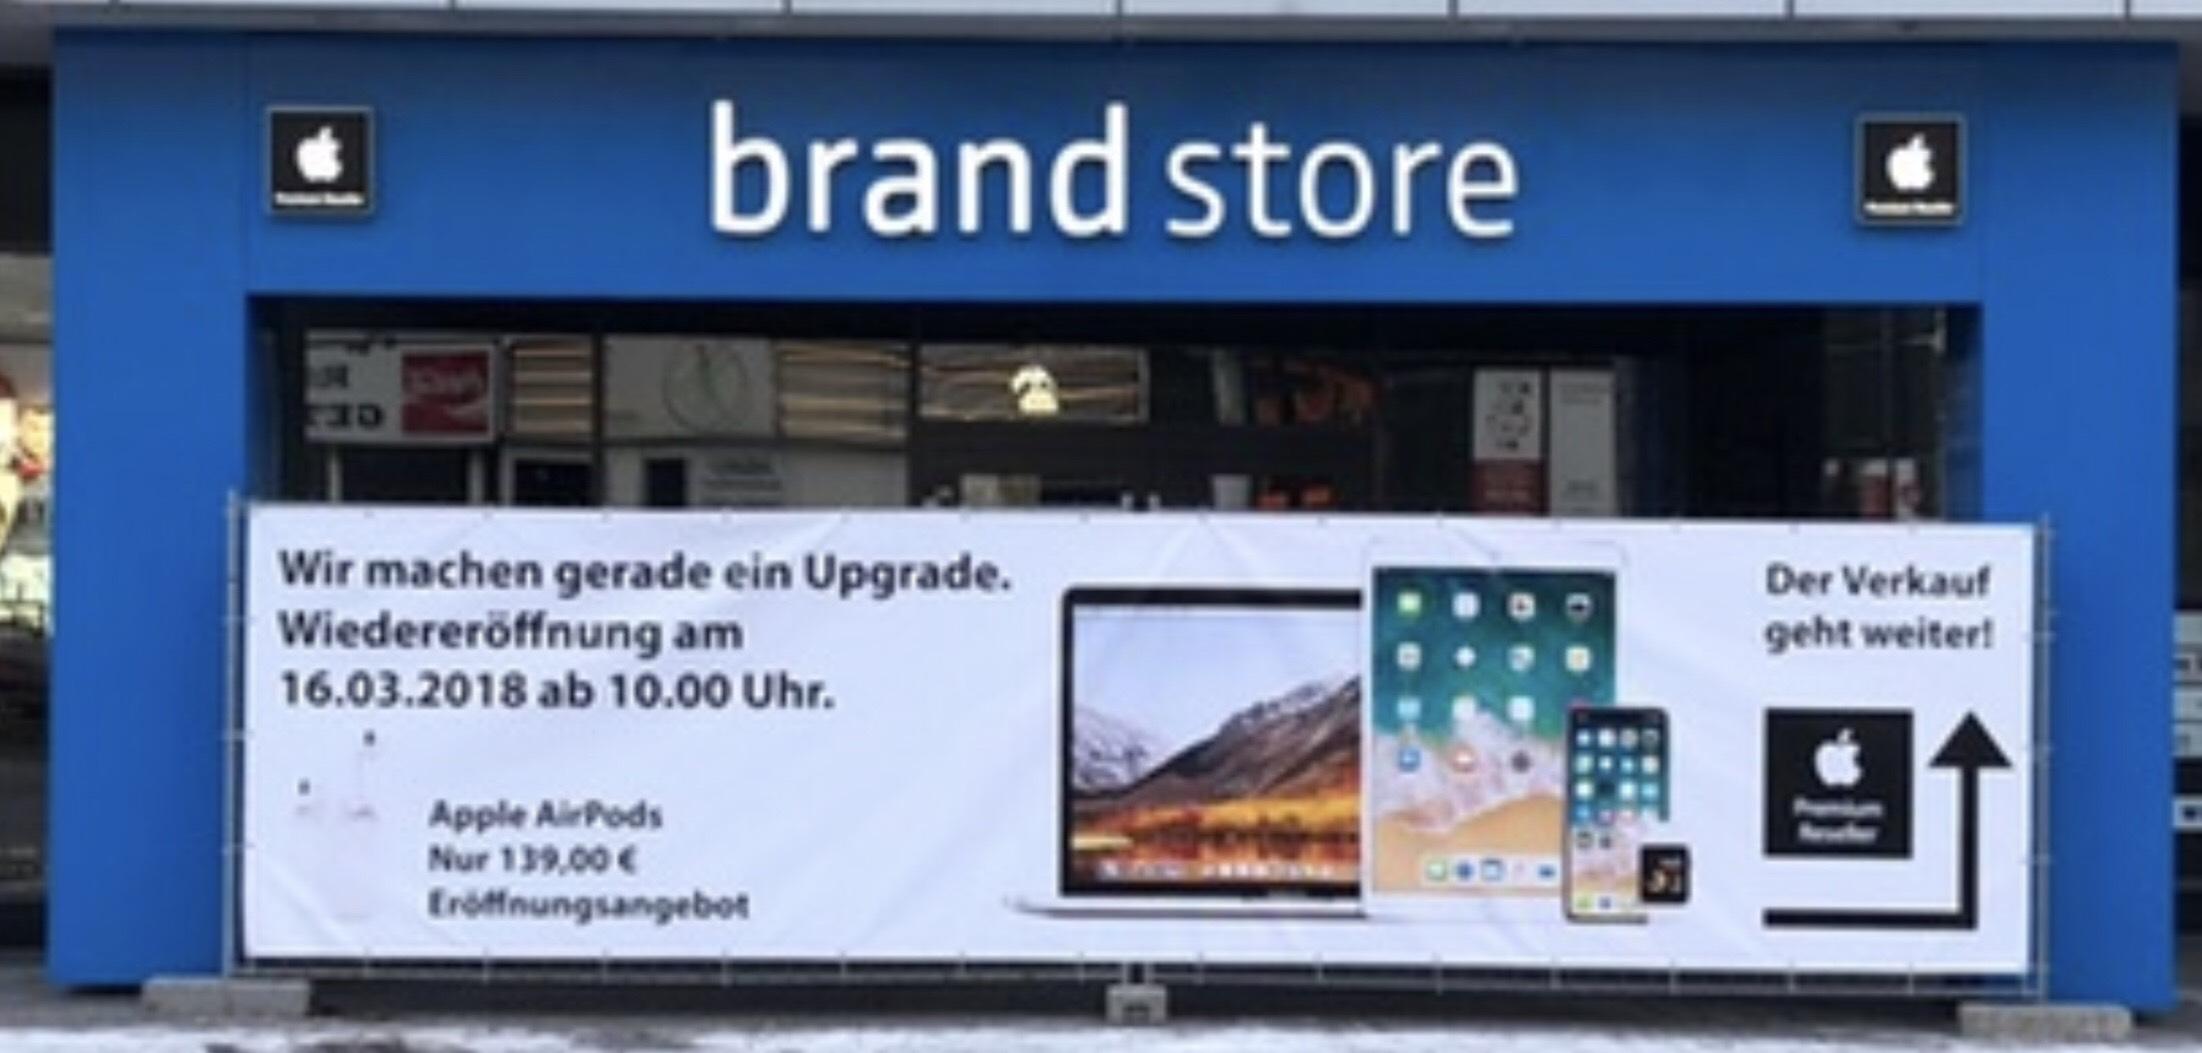 AirPods Brand Store ( Lokal Bielefeld) - mydealz.de